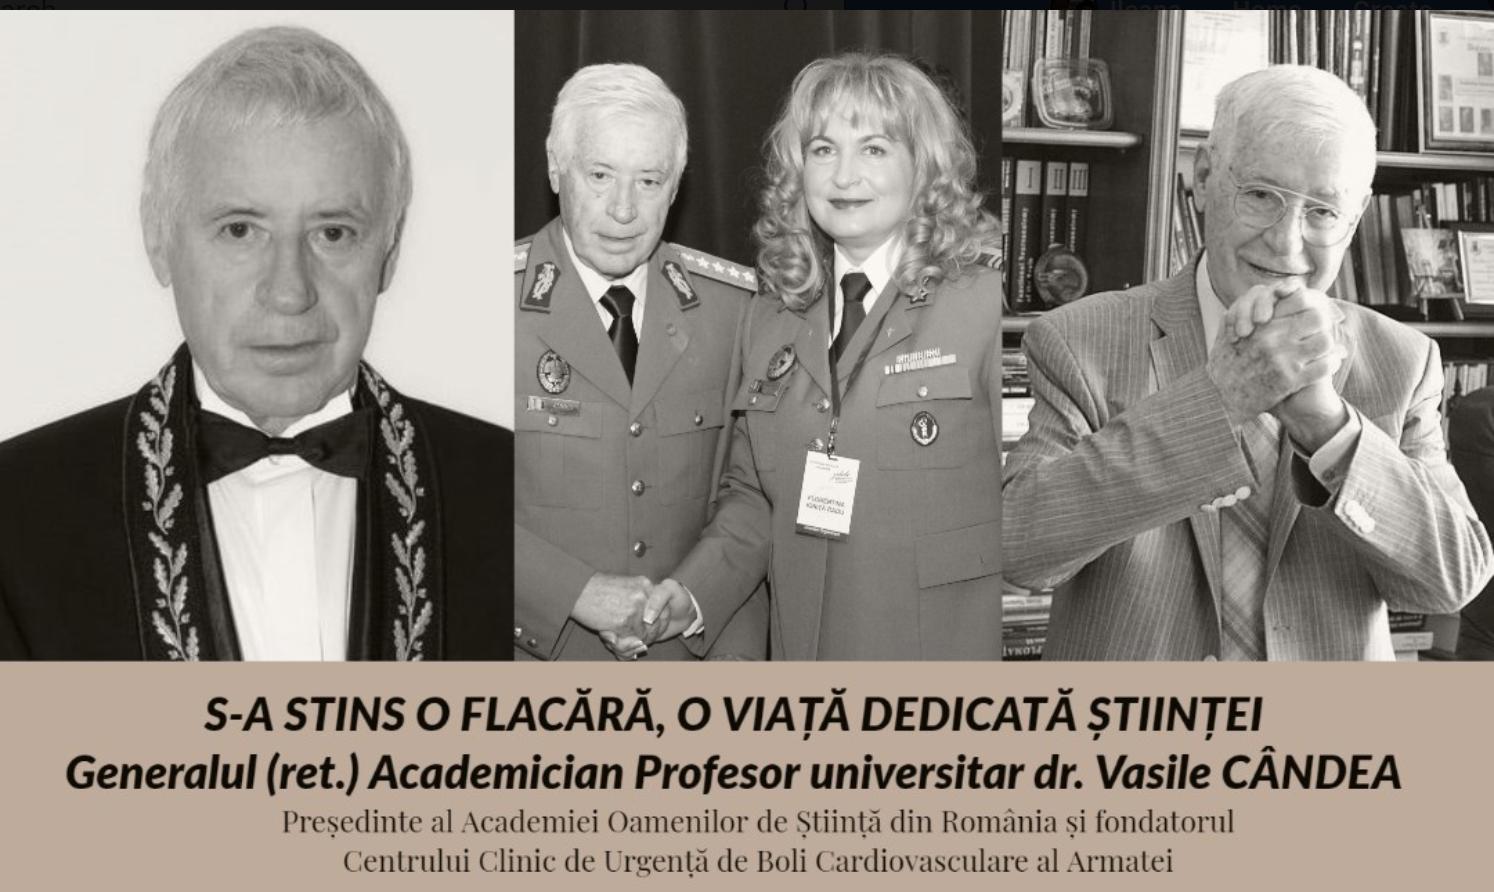 "Sursa: Spitalul Universitar de Urgență Militar Central ""Dr. Carol Davila"""